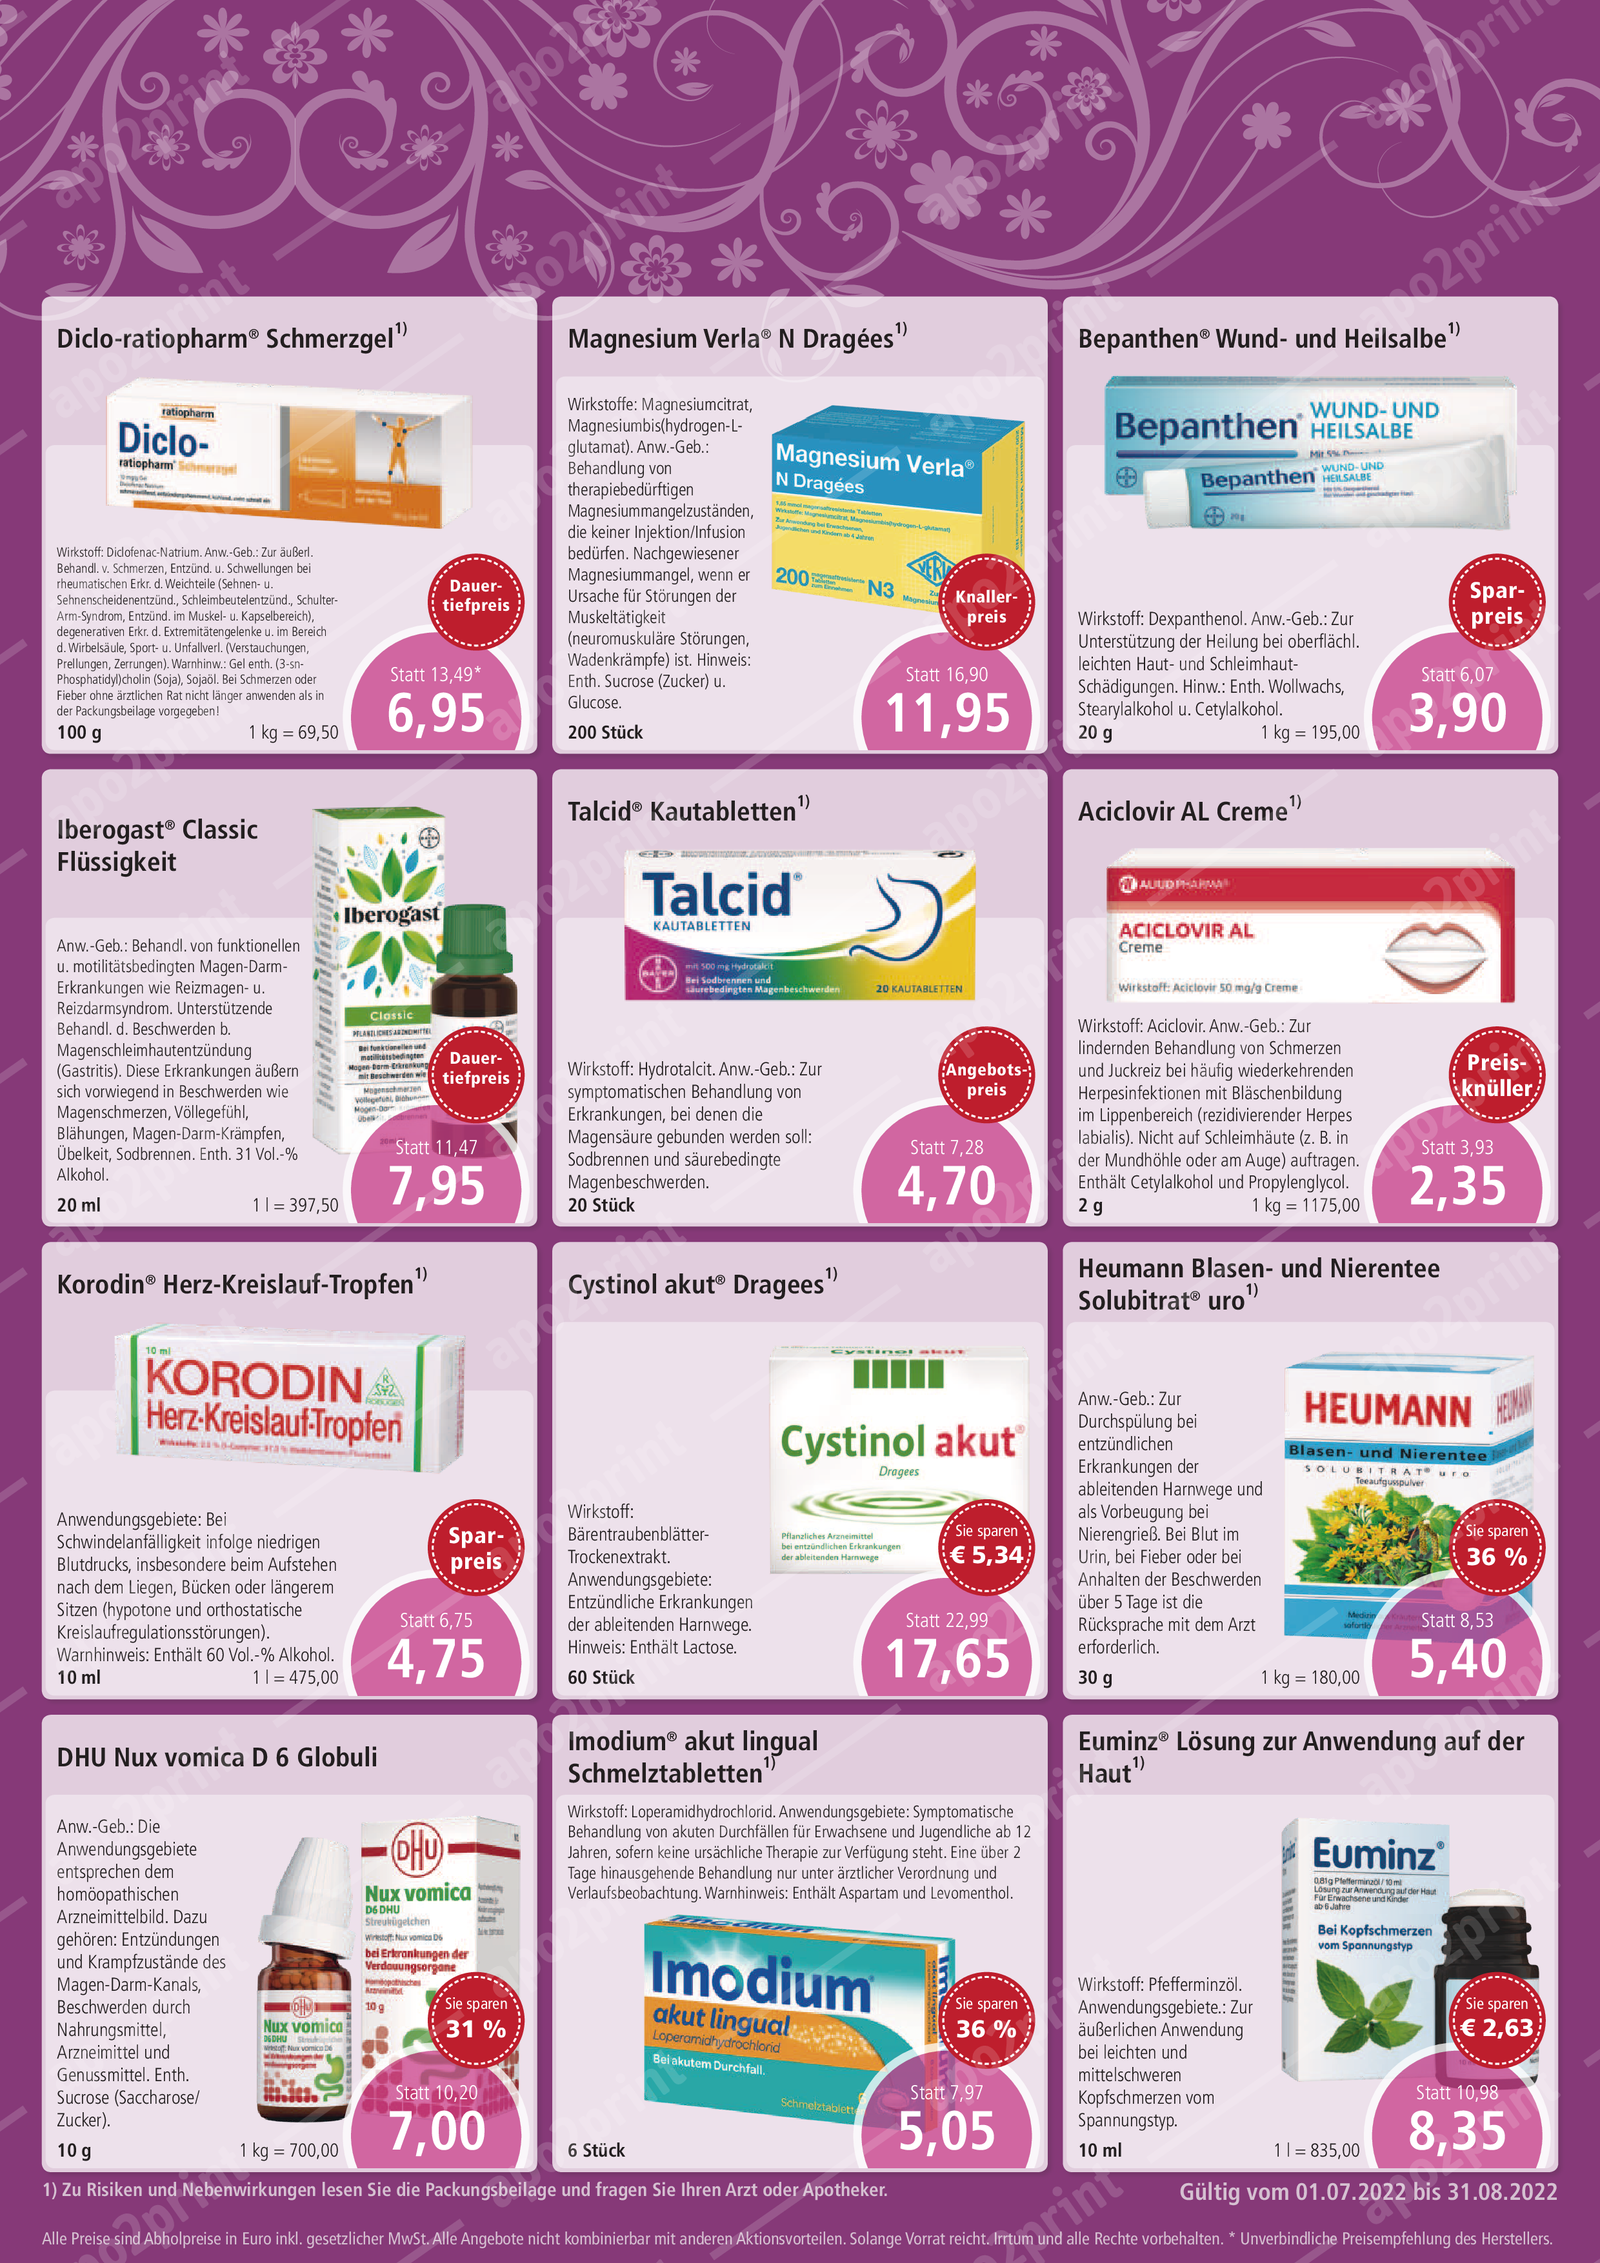 https://mein-uploads.apocdn.net/17060/leaflets/17060_flyer-Seite2.png